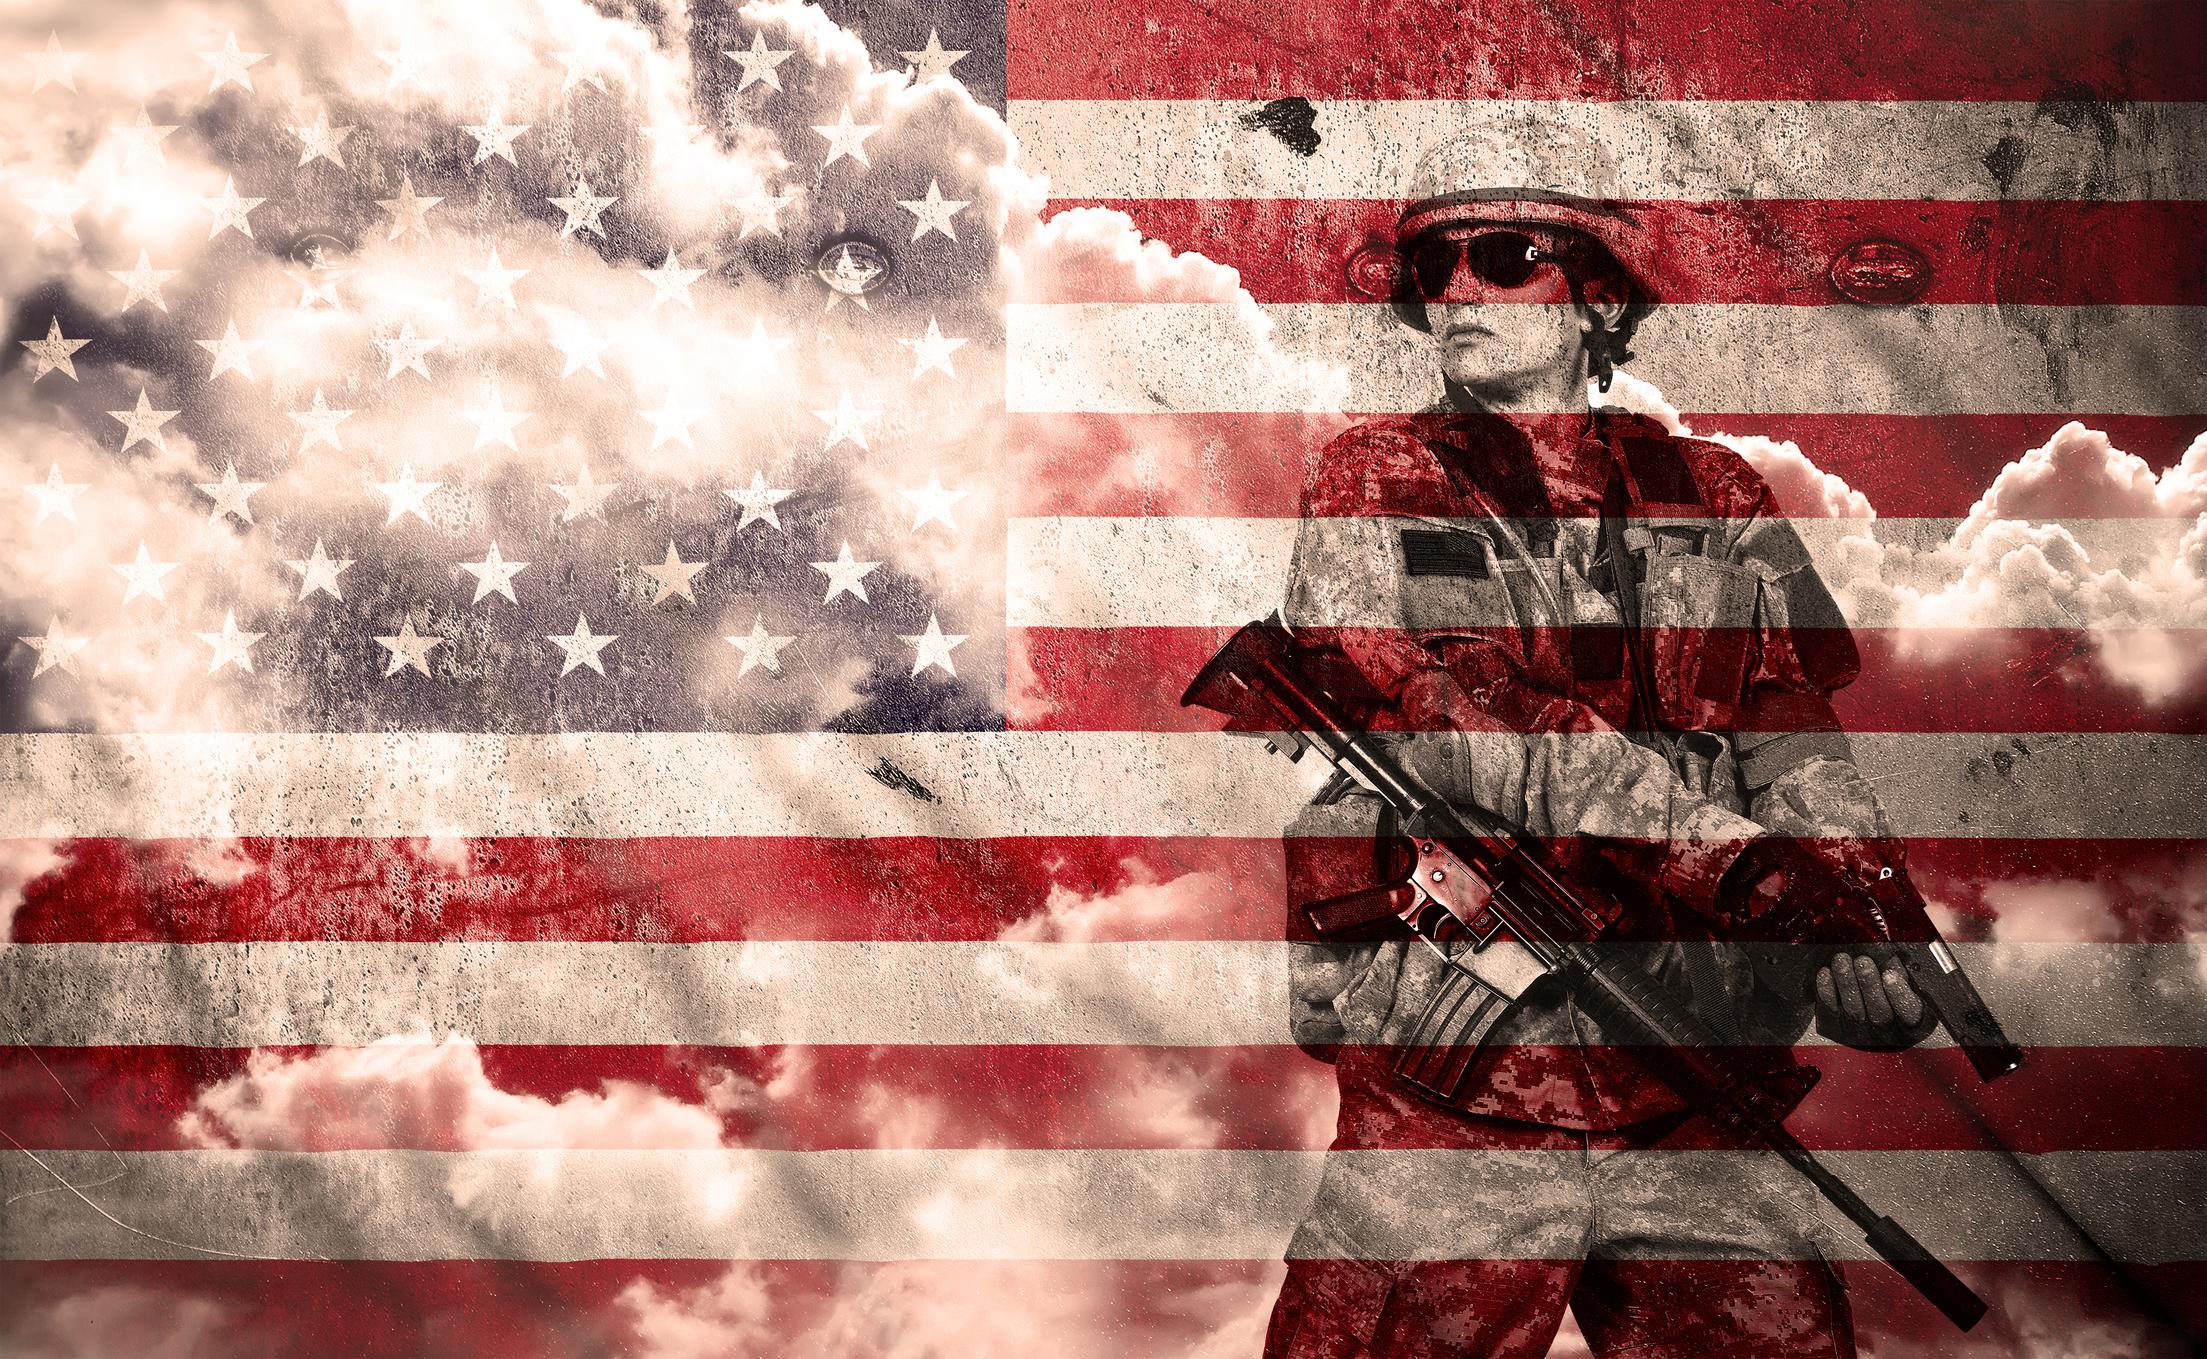 A Foolish Take: A Retirement Plan to Protect Veterans